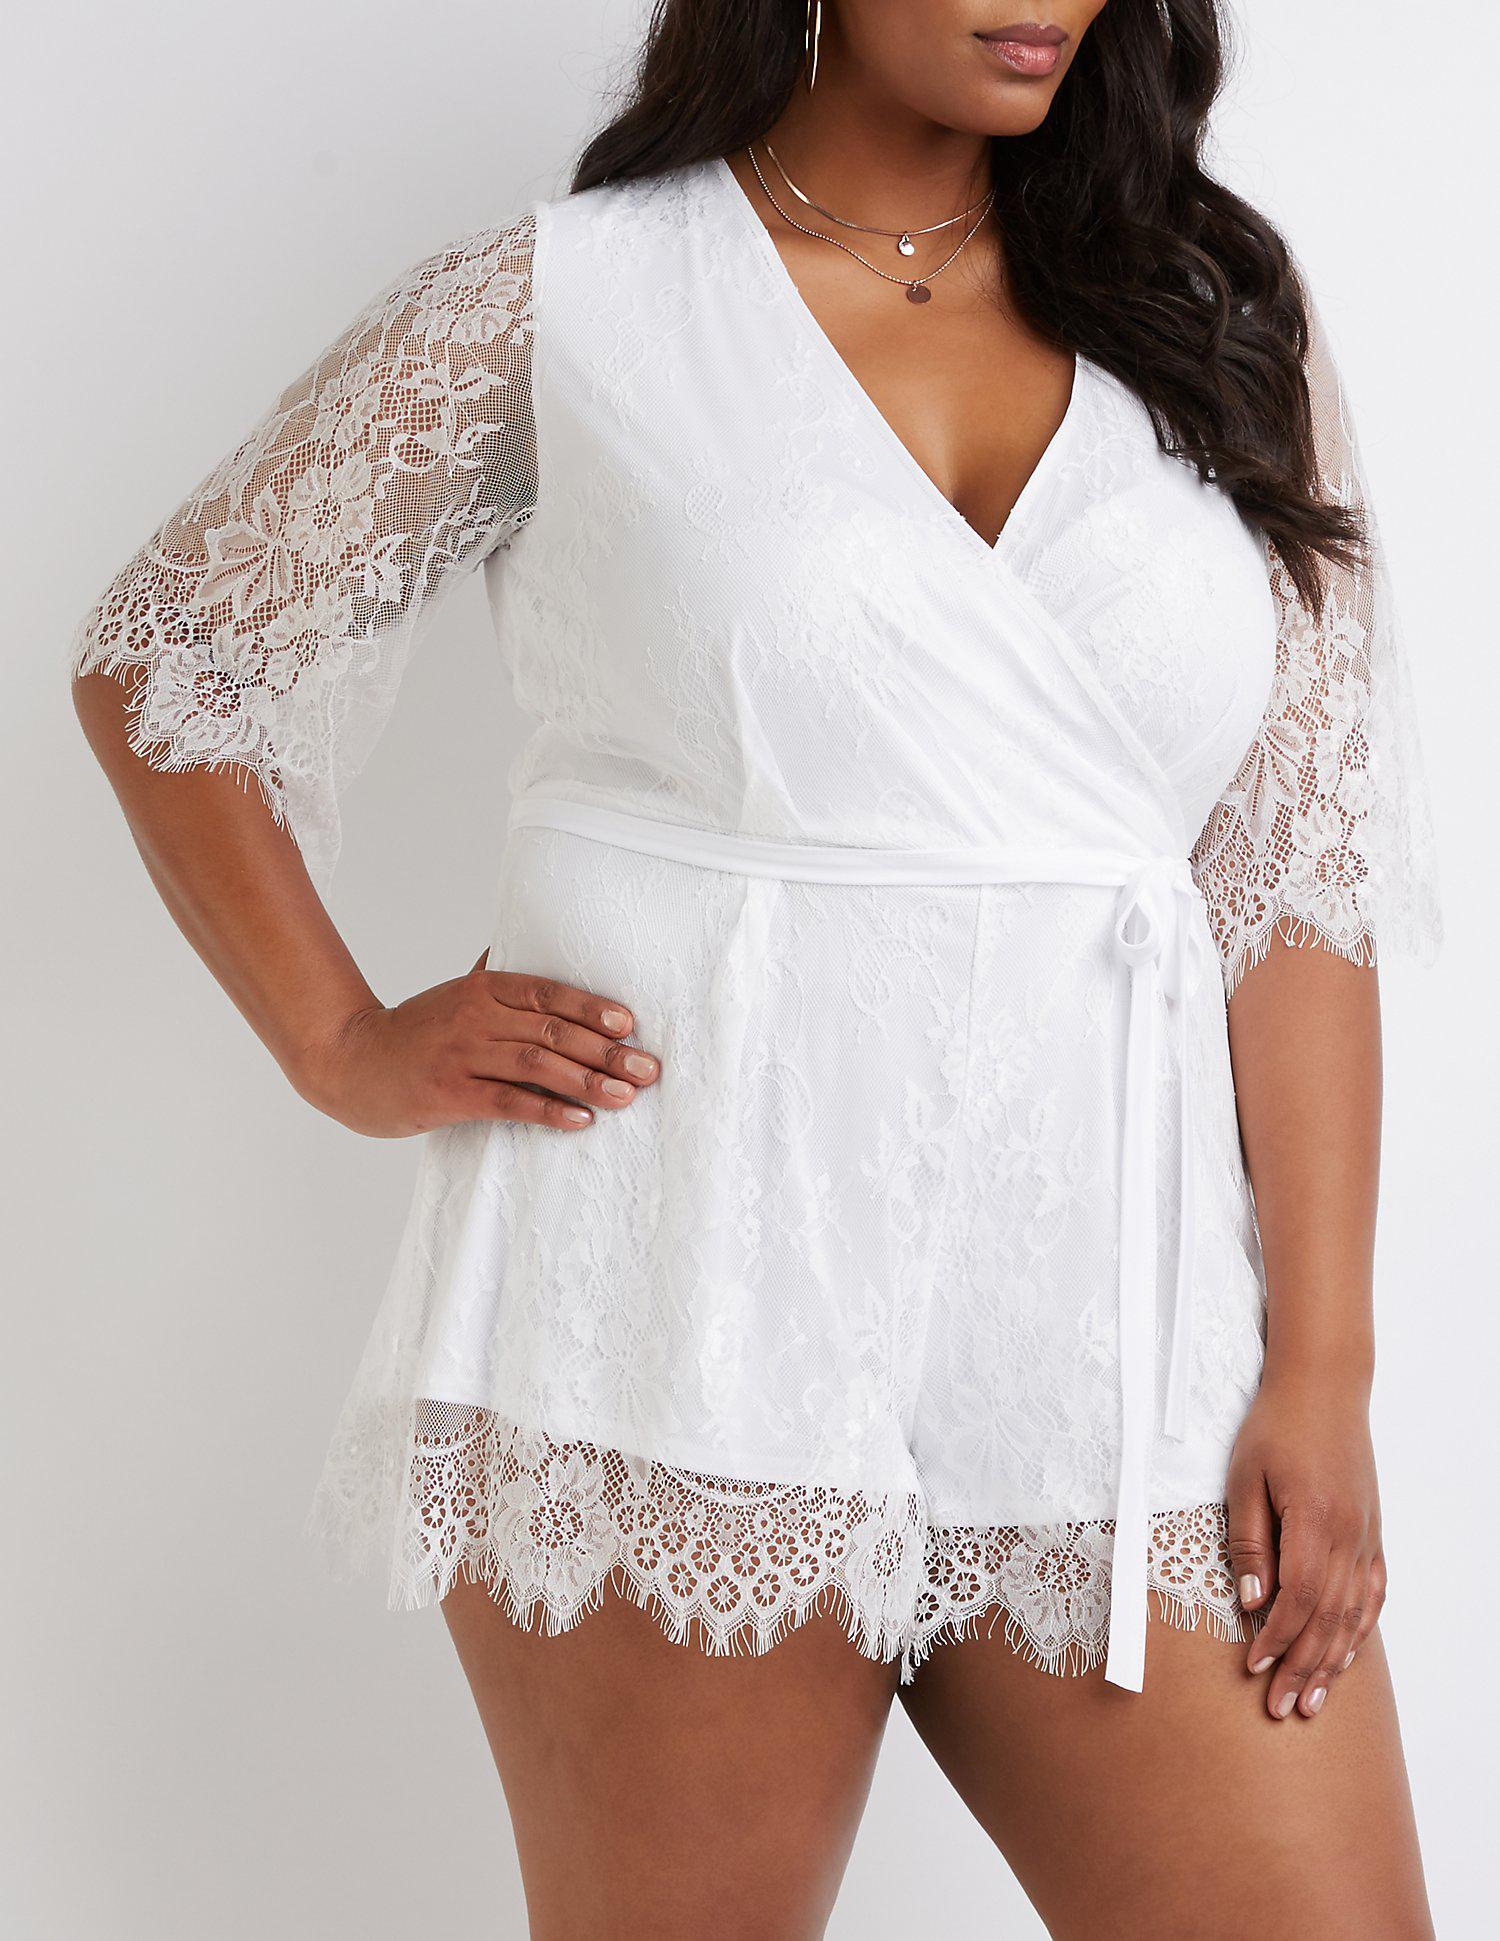 05d8c0e0821a Lyst - Charlotte Russe Plus Size Floral Lace Wrap Romper in White